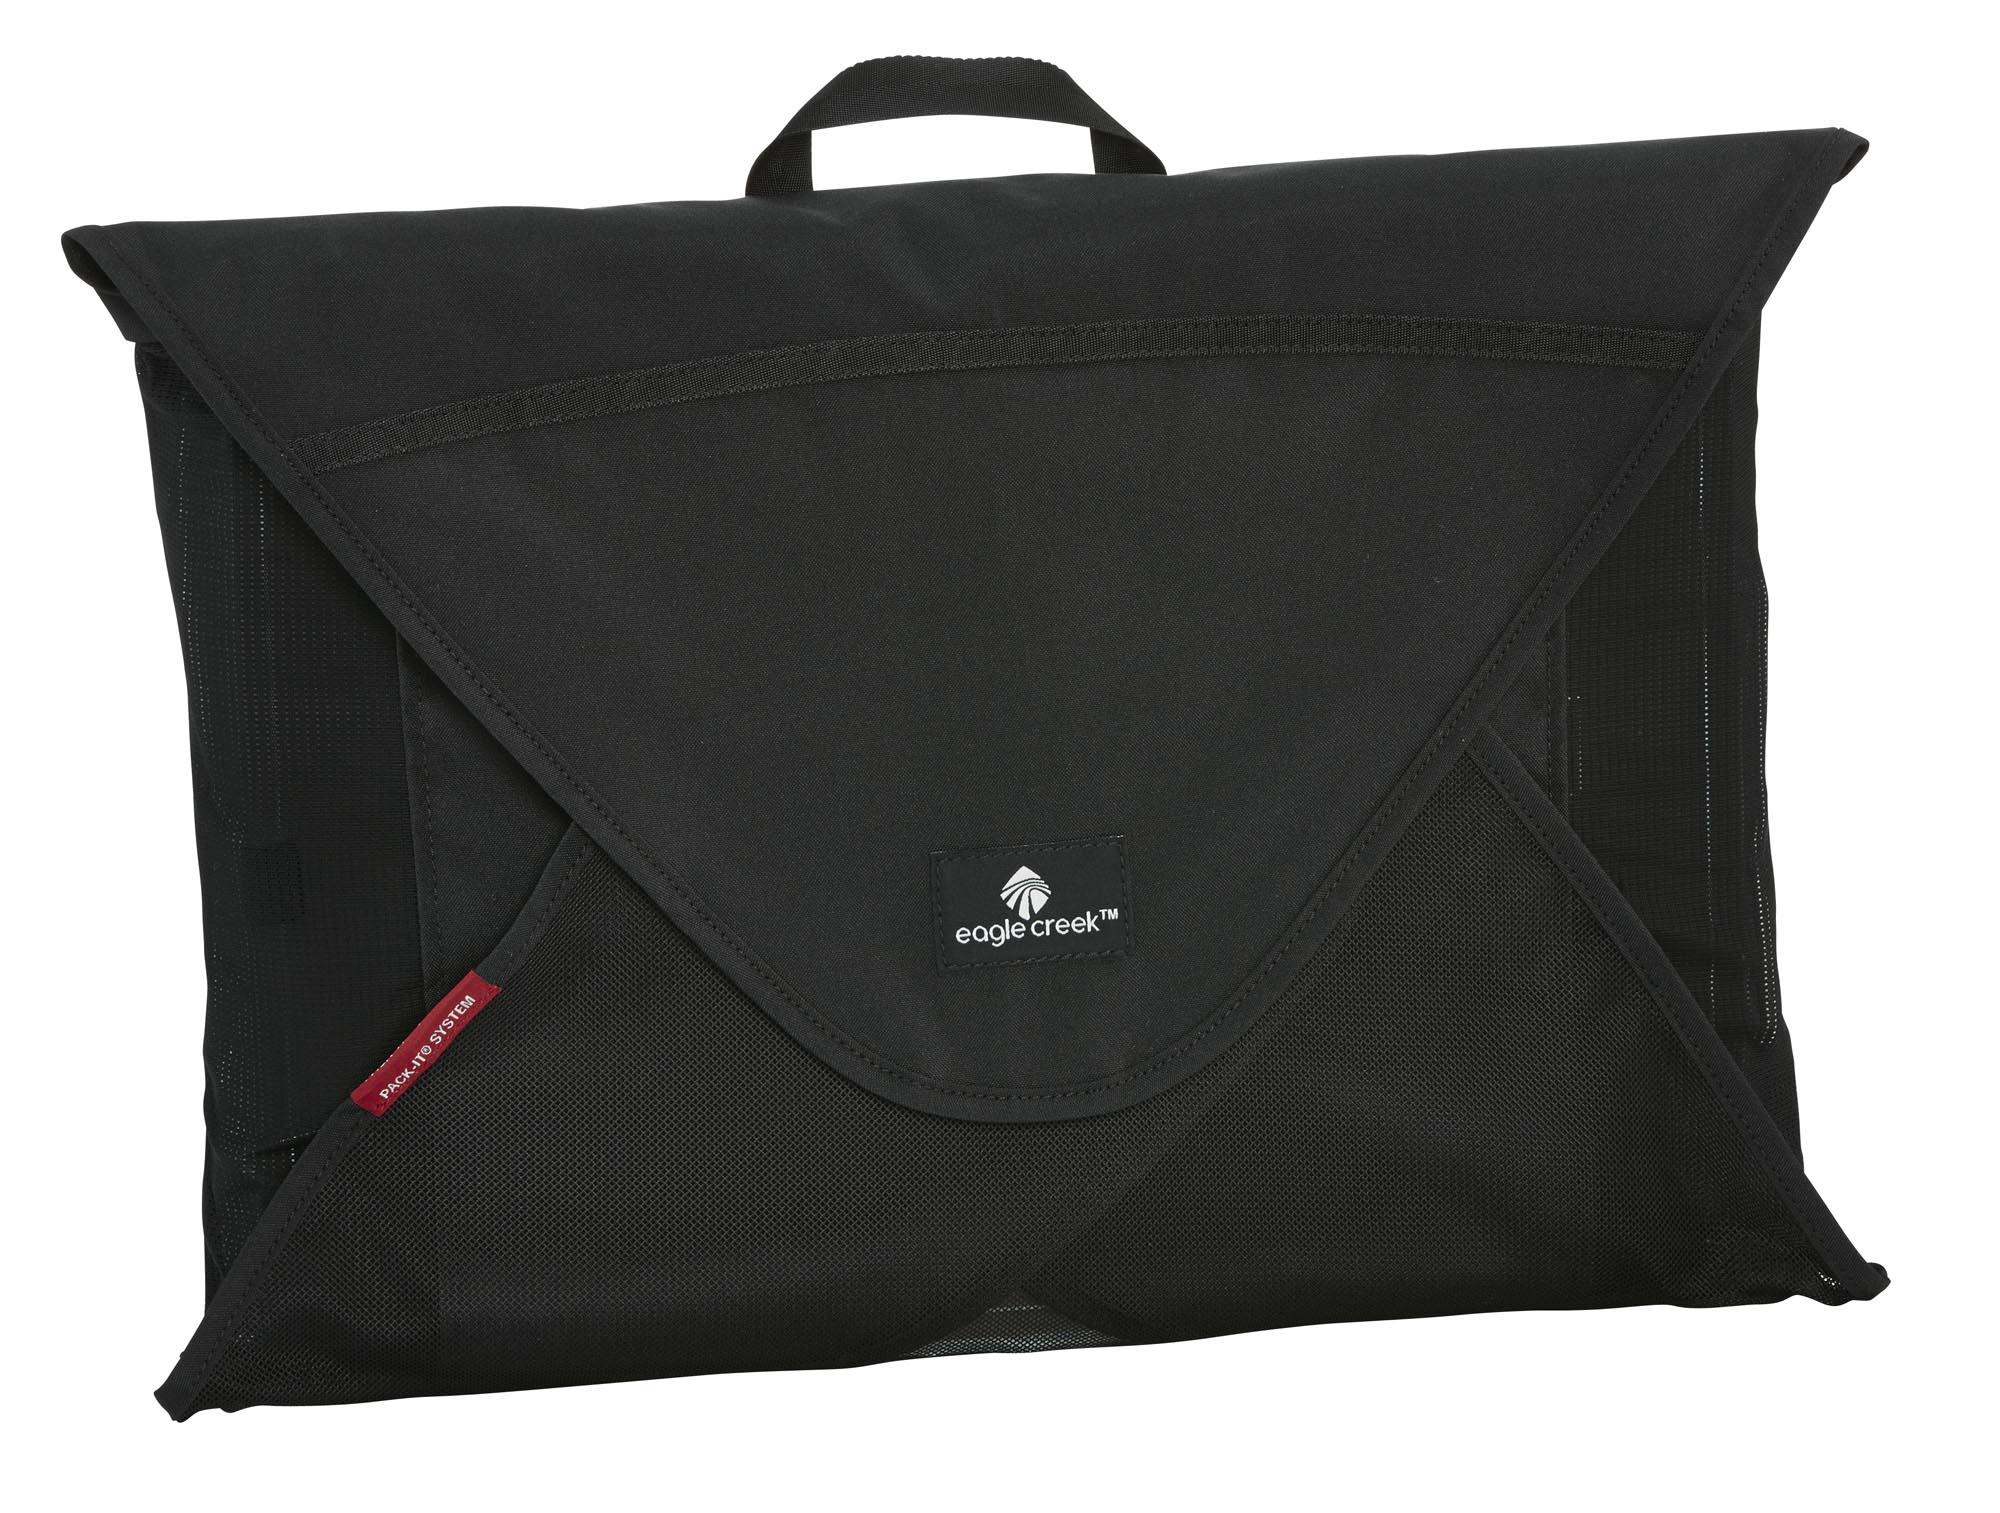 EagleCreek - Pack-It Garment Folder Medium Black - Packing Bags -